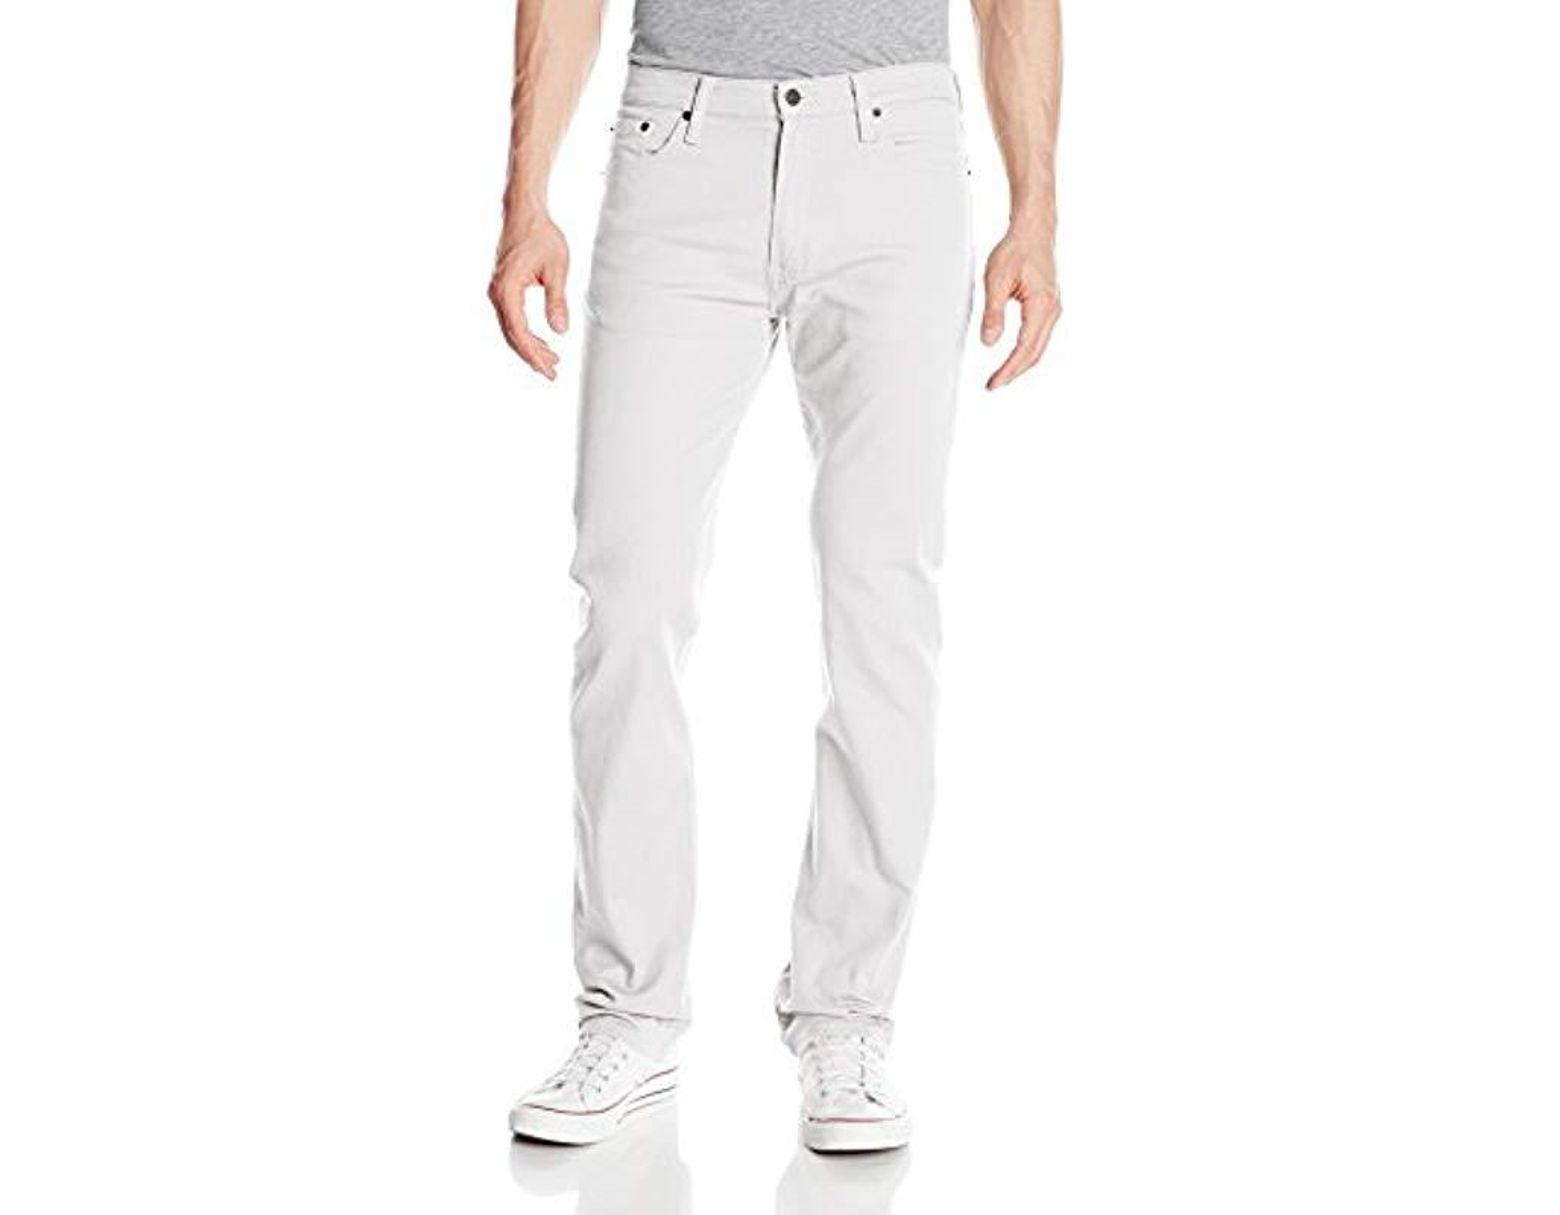 b33b59b031f Levi's 513 Slim Straight Jean in White for Men - Save 19% - Lyst